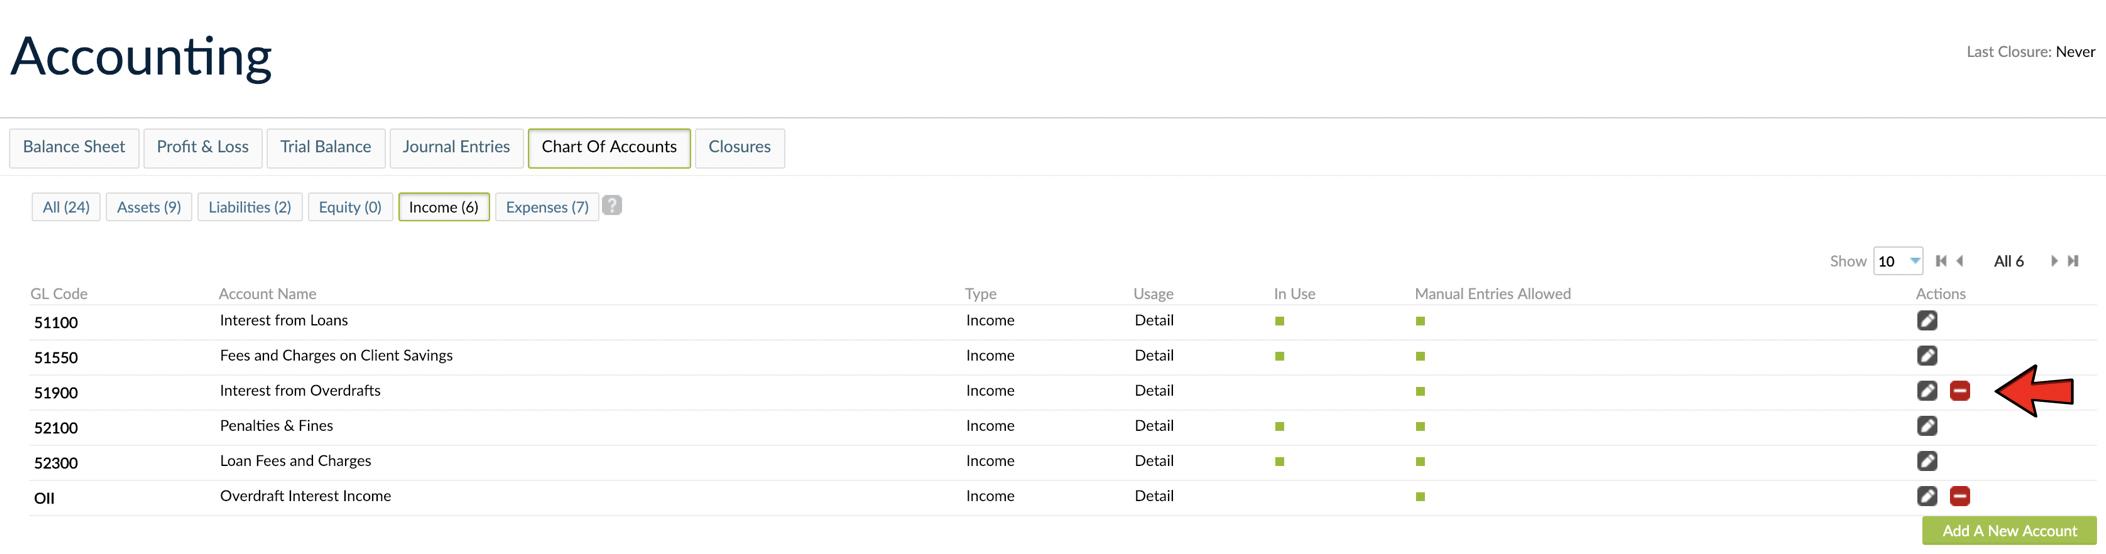 Delete GL Accounts - minus button found on each row